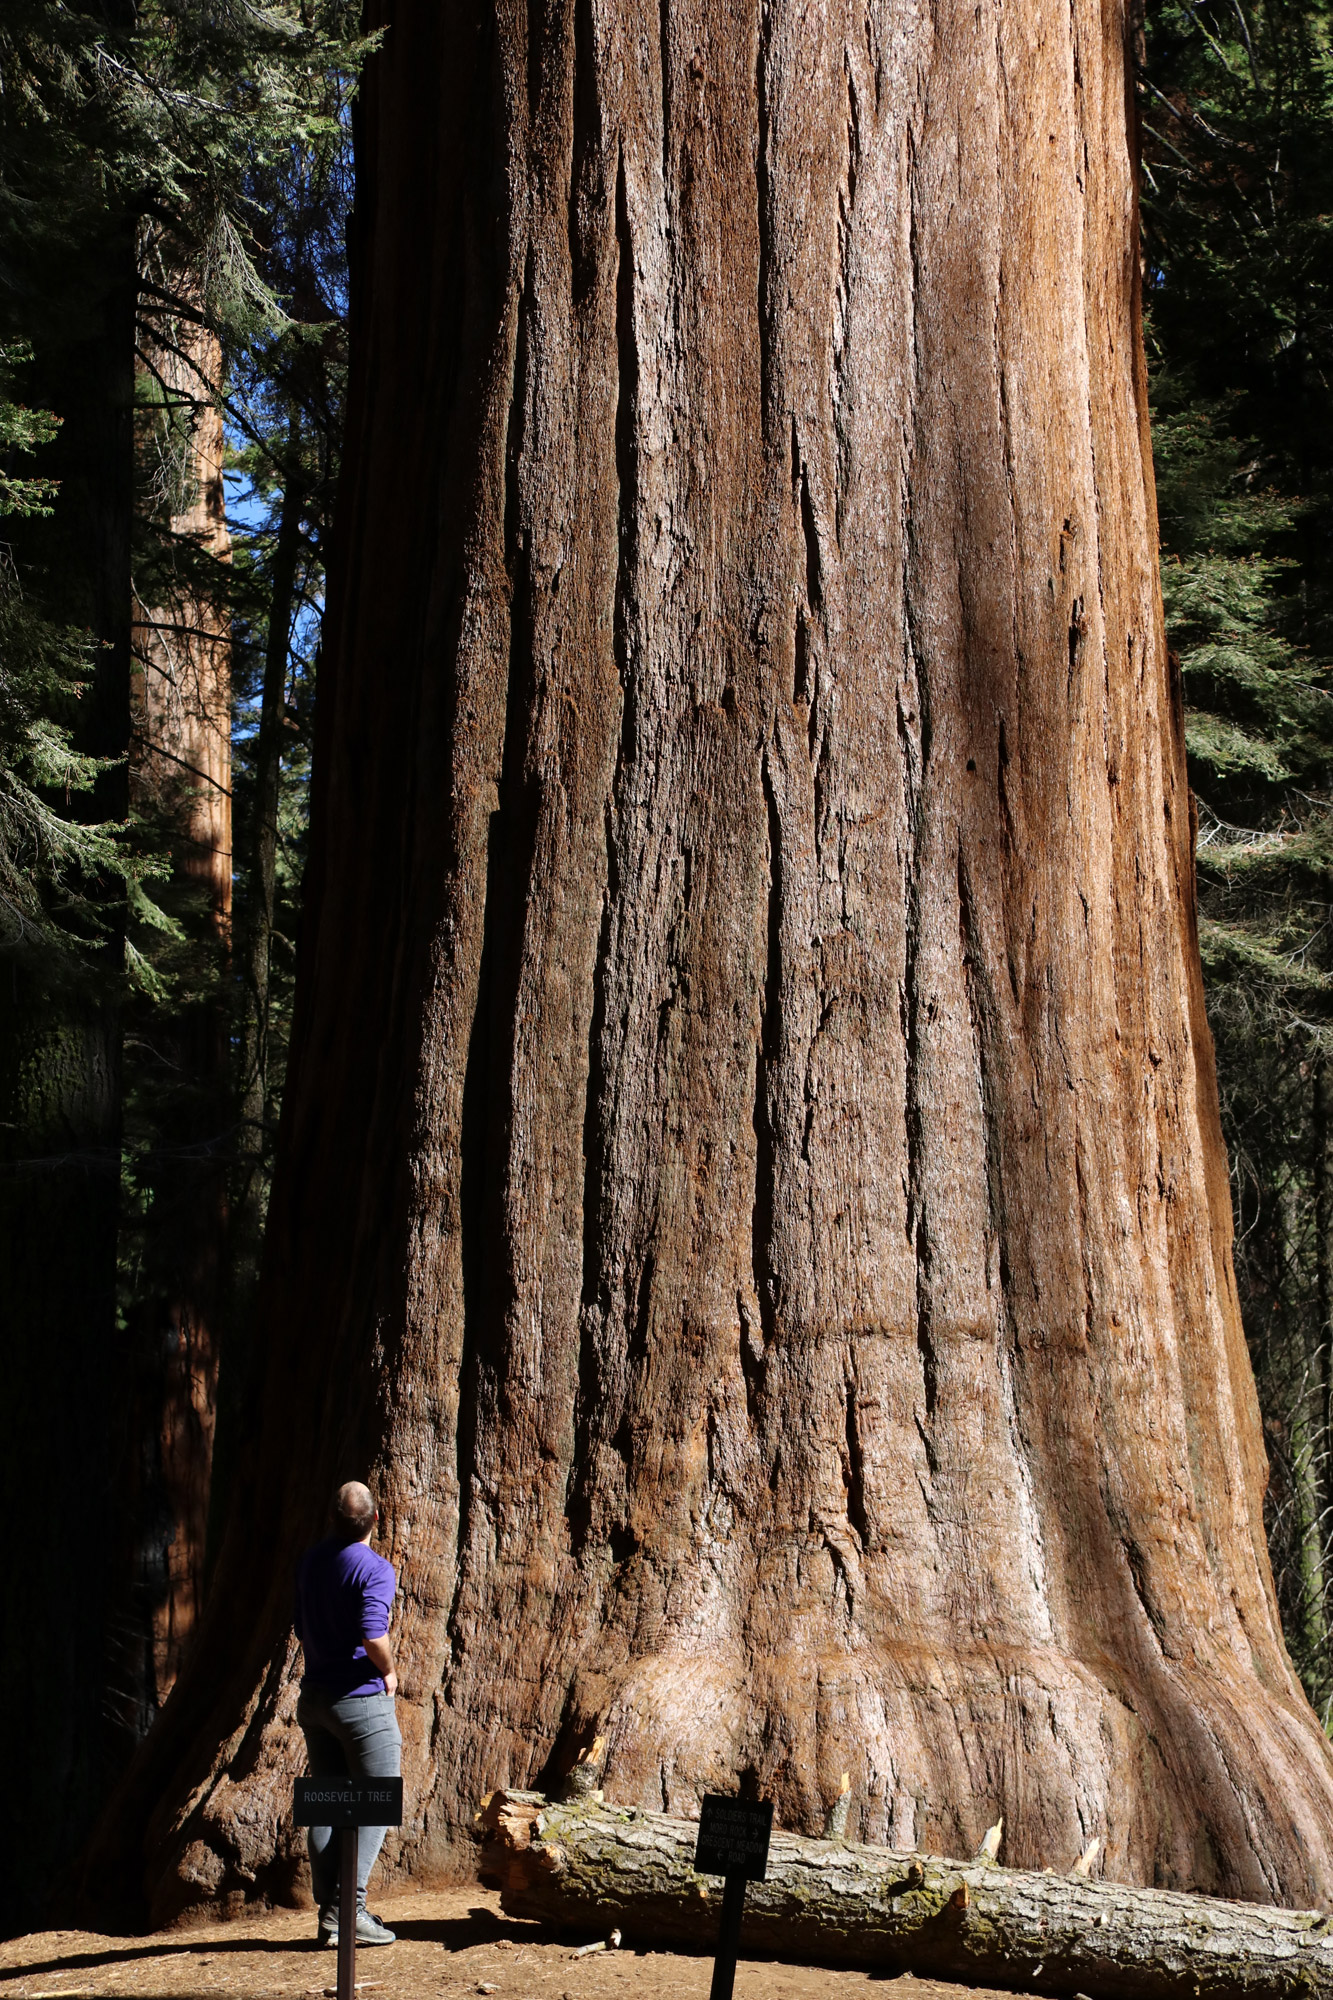 Amerika dag 19 - Sequioa National Park - Roosevelt Tree